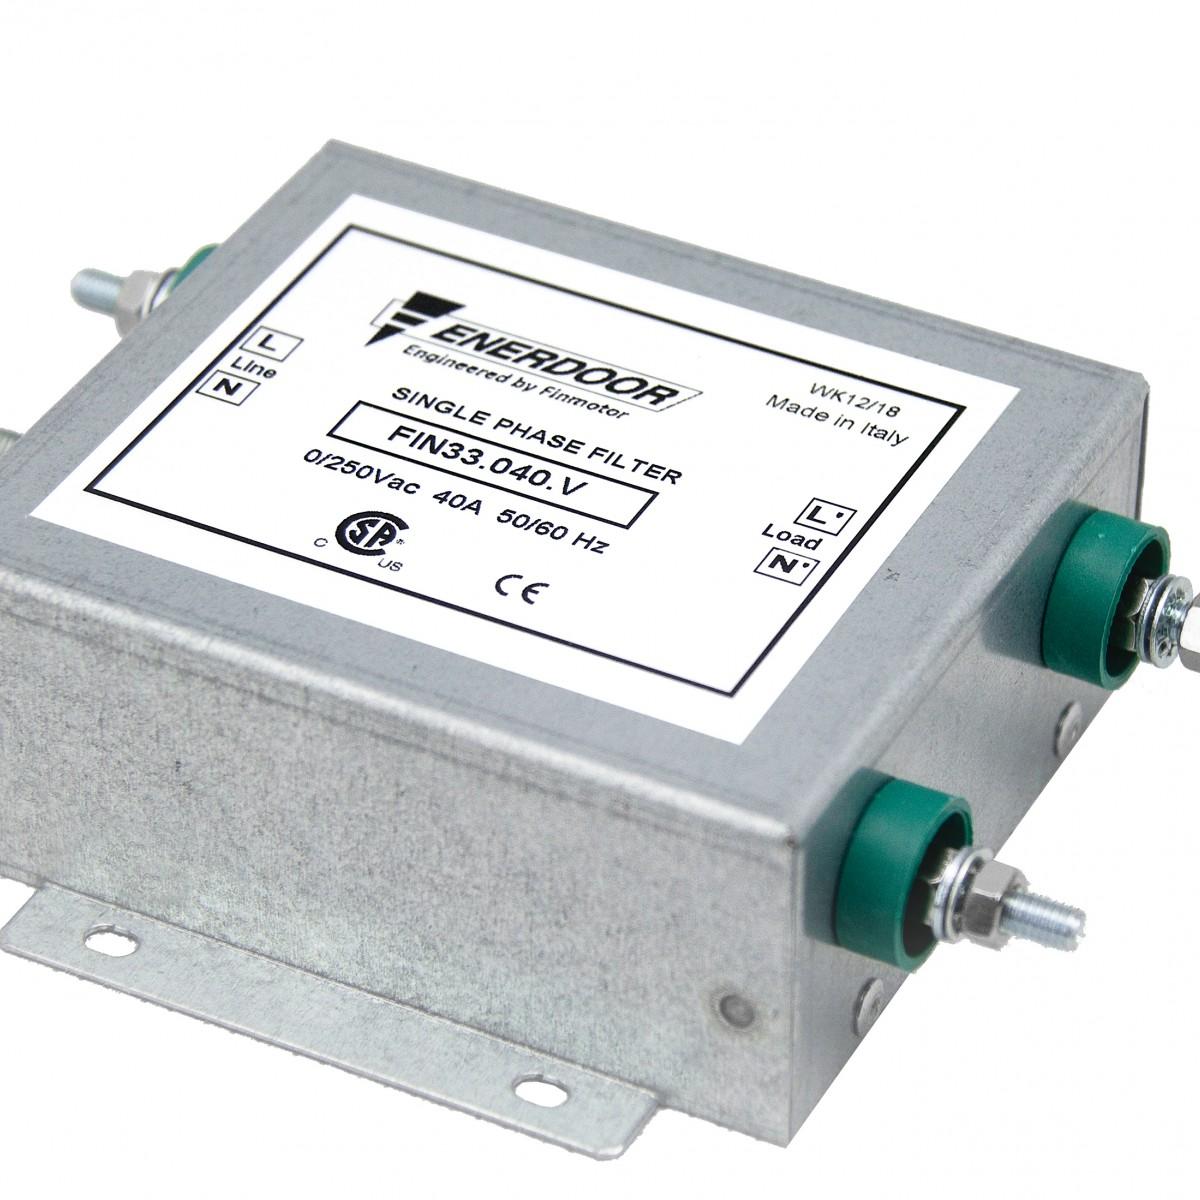 FIN33 EMI RFI Single Phase Filter   Enerdoor   EMI Filters and RFI Filters